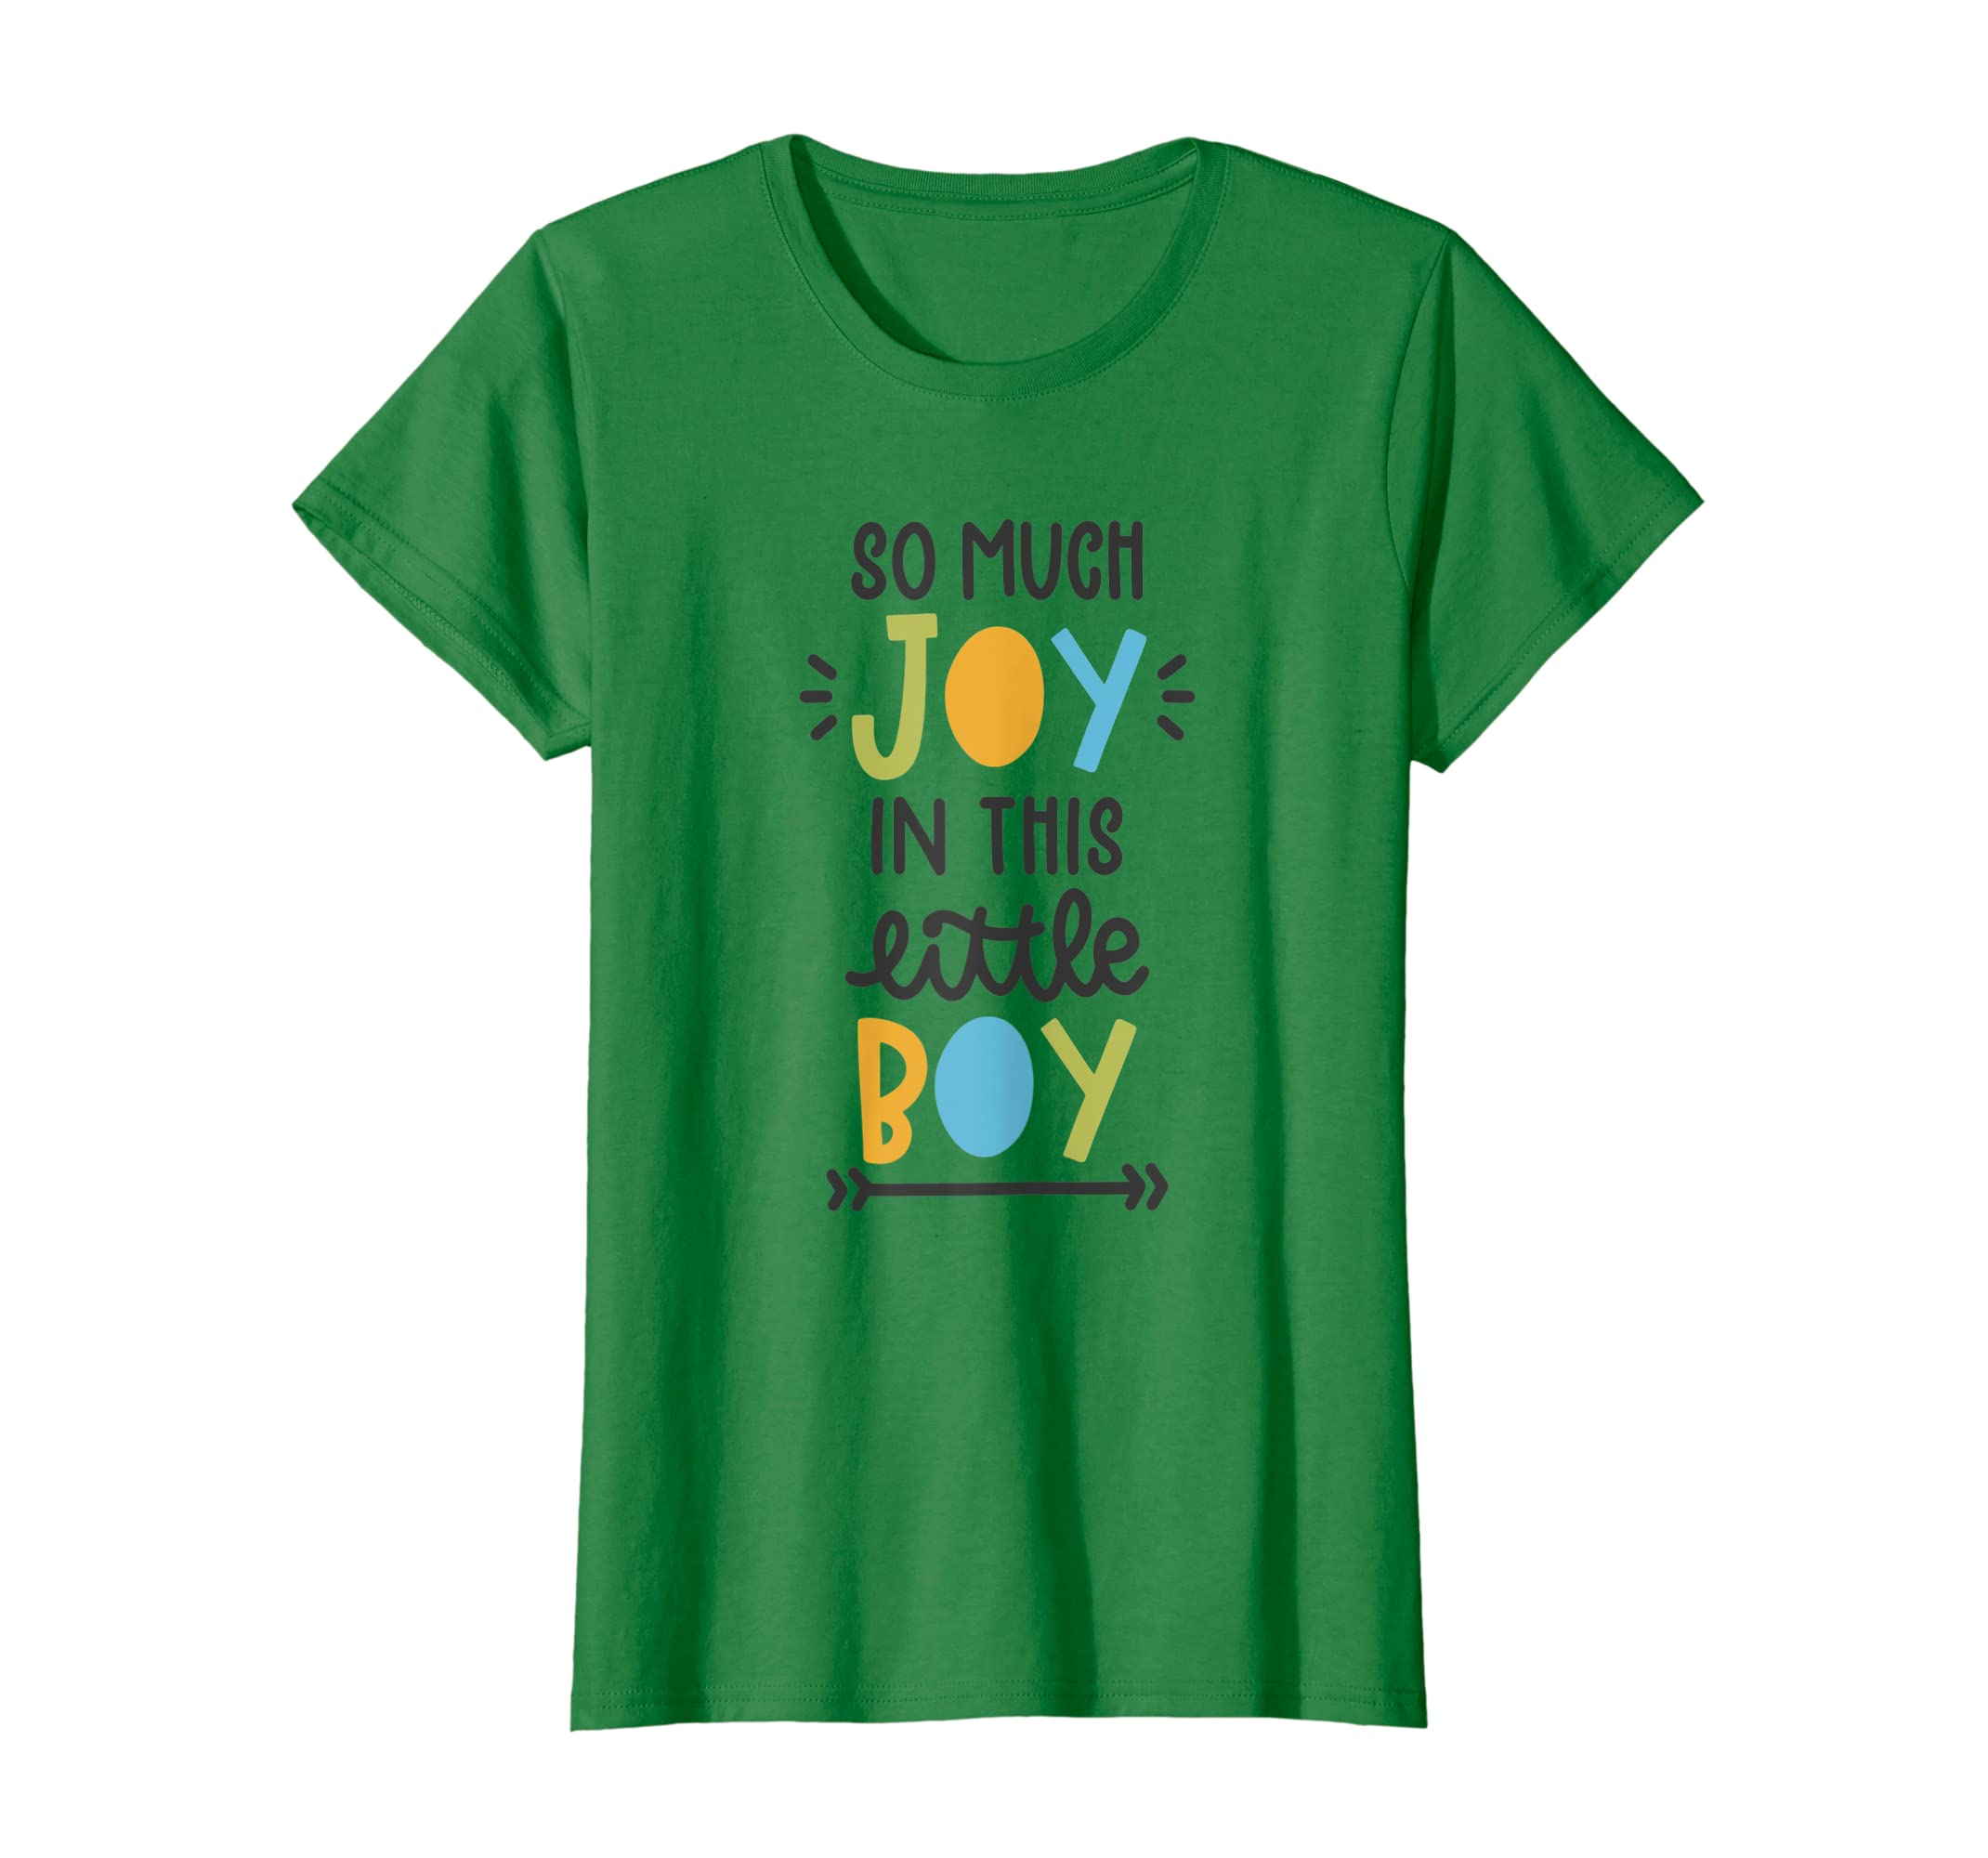 6dc03c07e91 Amazon.com  So Much Joy In This Little Boy Shirt Kids Son Grandson  Clothing